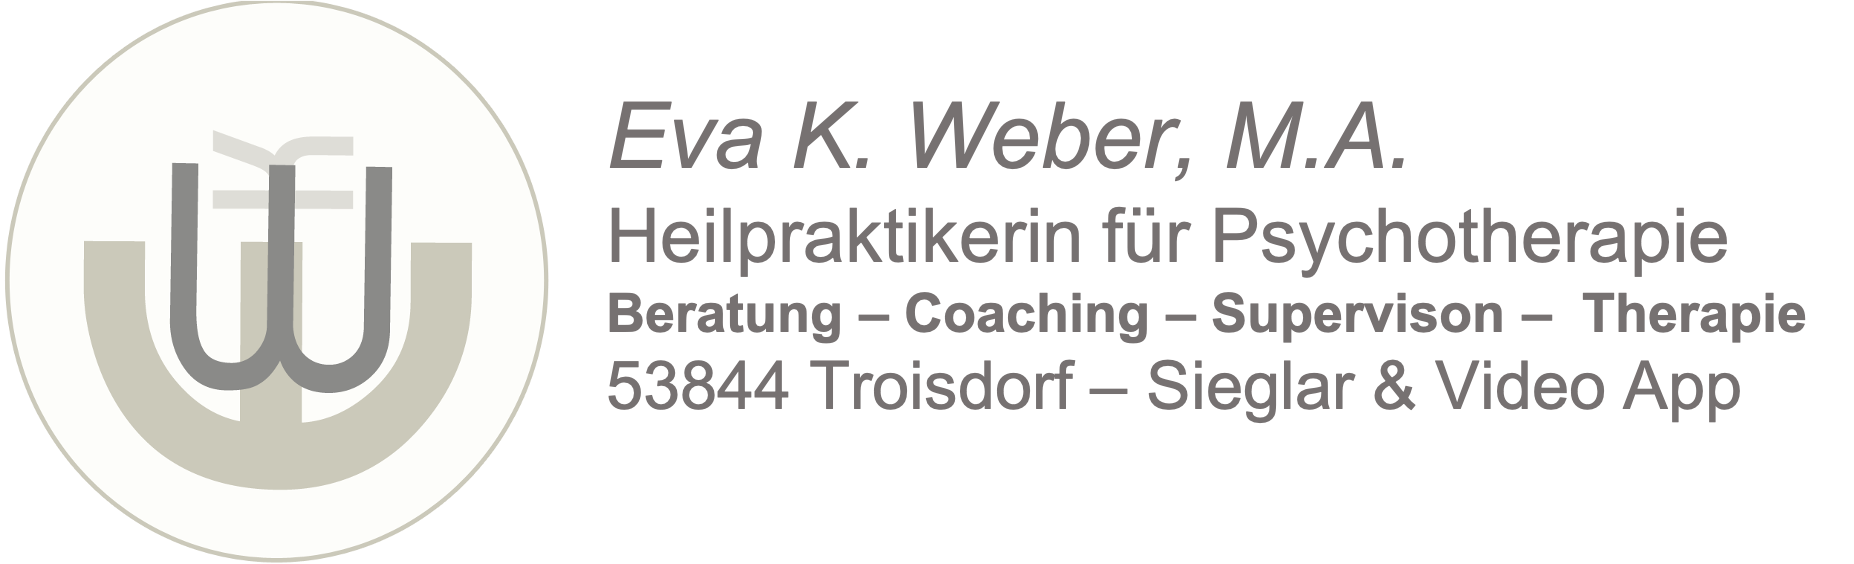 Eva K. Weber – Gestaltist